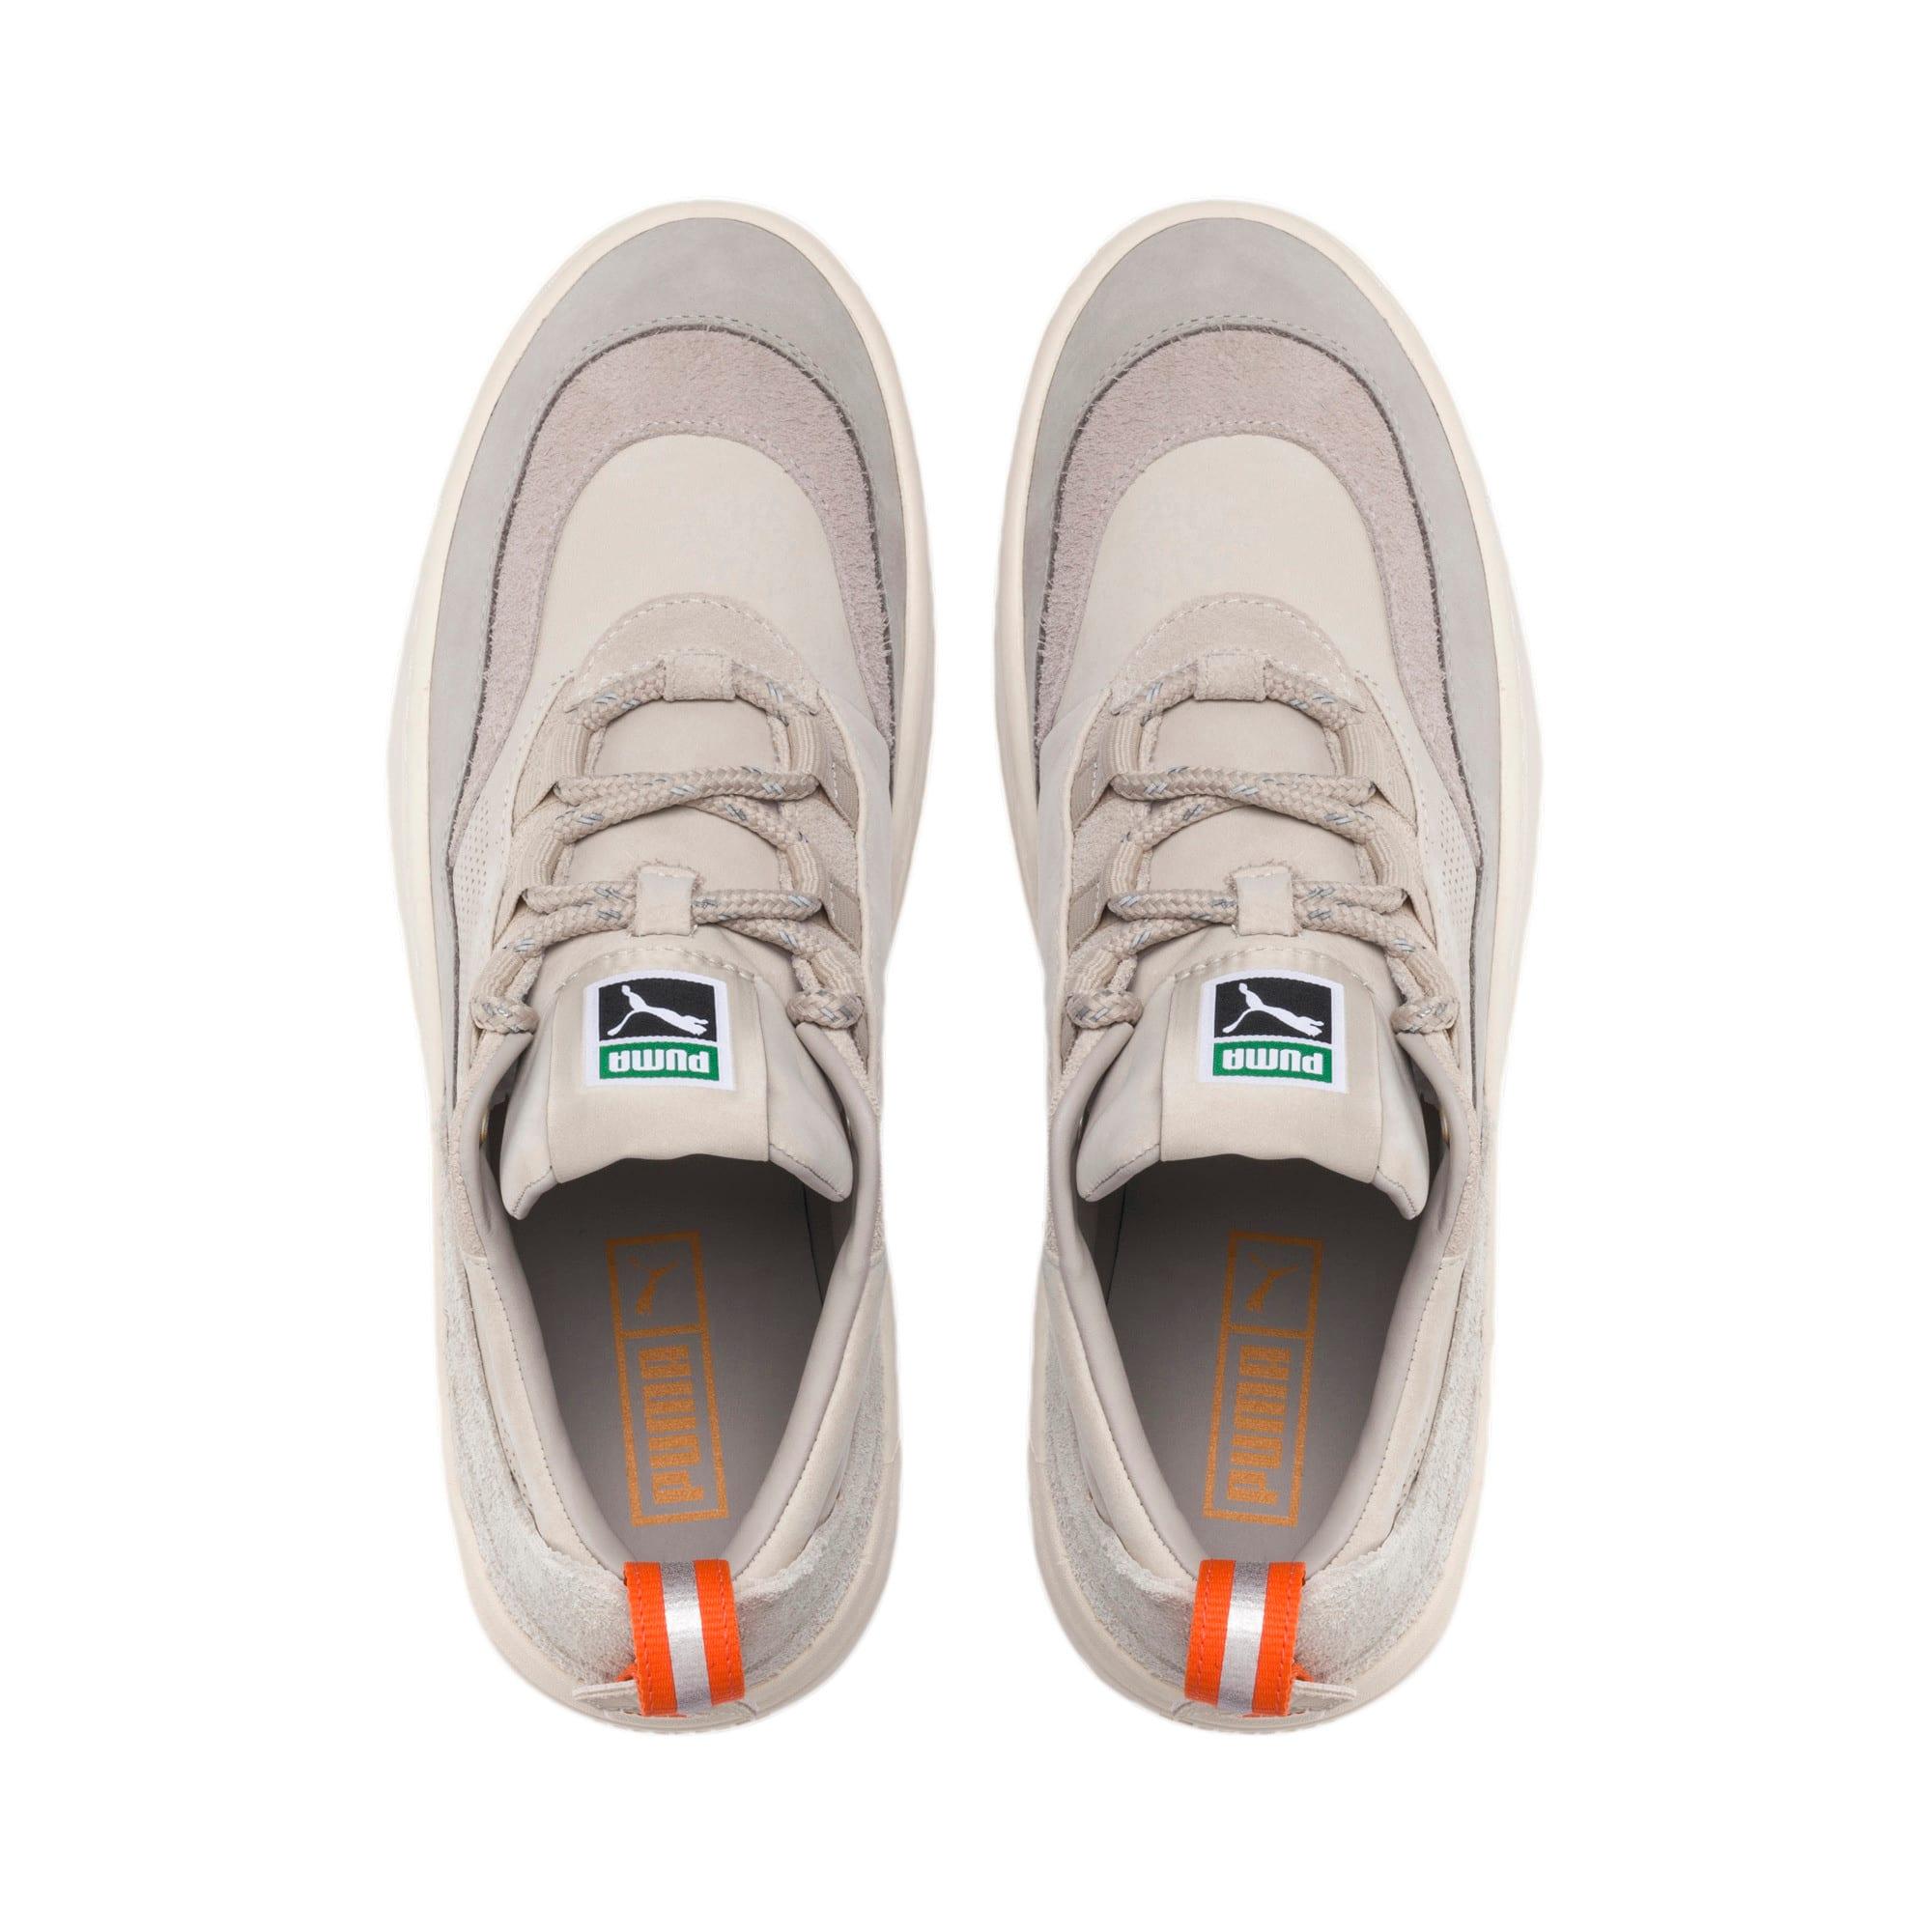 Imagen en miniatura 6 de Zapatillas Cali Zero Demi Beige, Satellite-Silver Gray, mediana